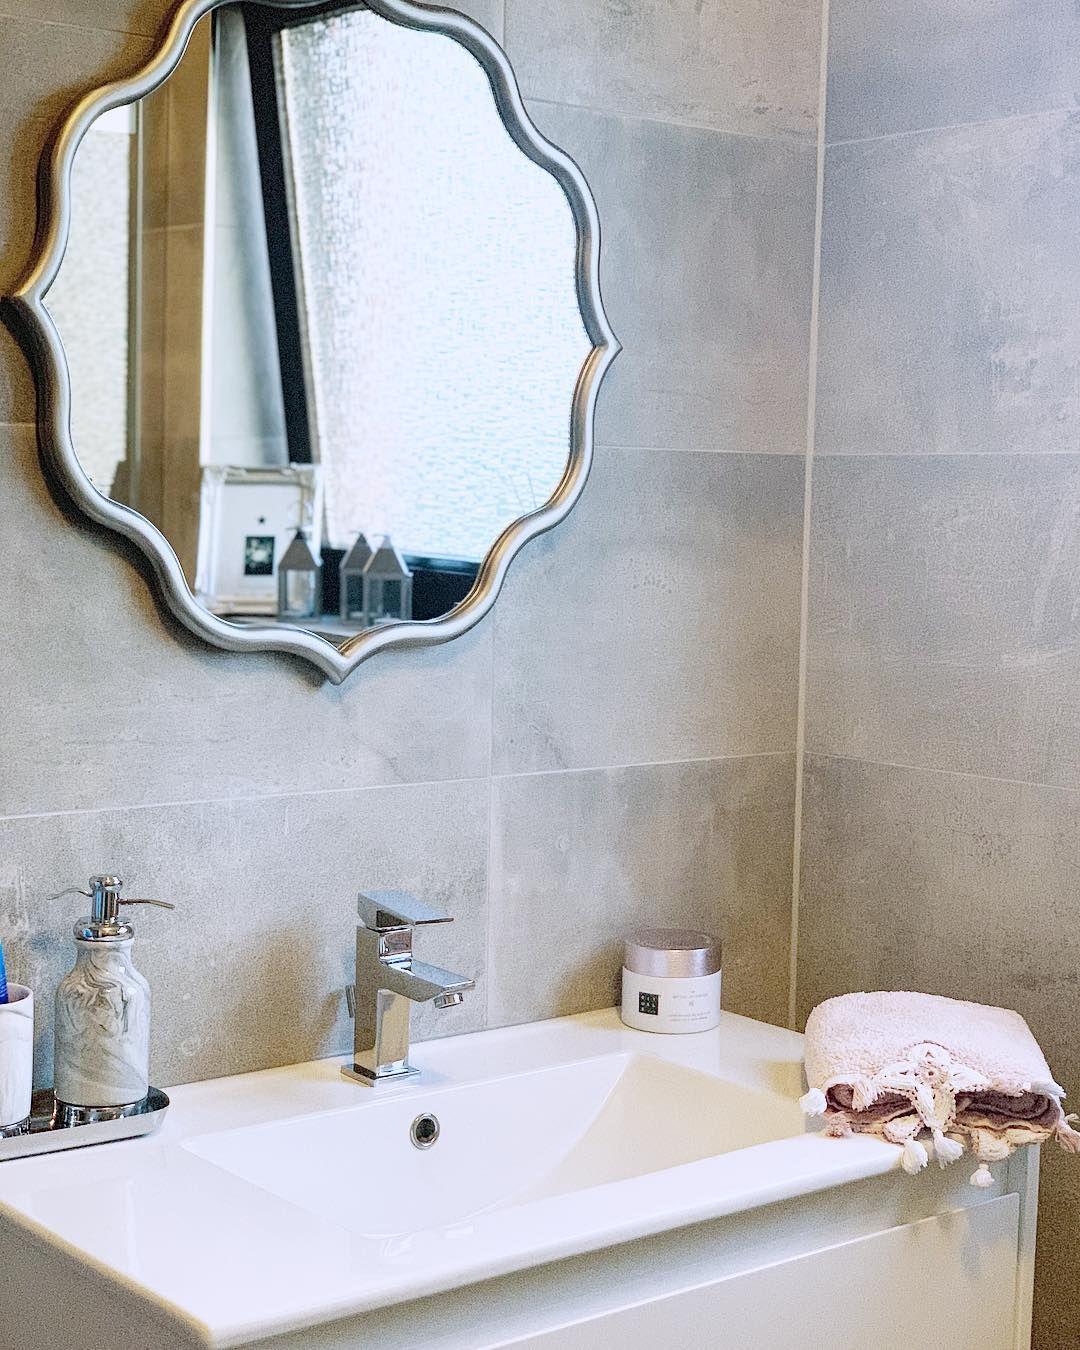 Bath Grey Bathroom Interiordesign Interior Decoration Decor Flowers Wohnung Bad Badezimmer Dekoration Dek Upcycled Home Decor Diamond Bedroom Cushions On Sofa